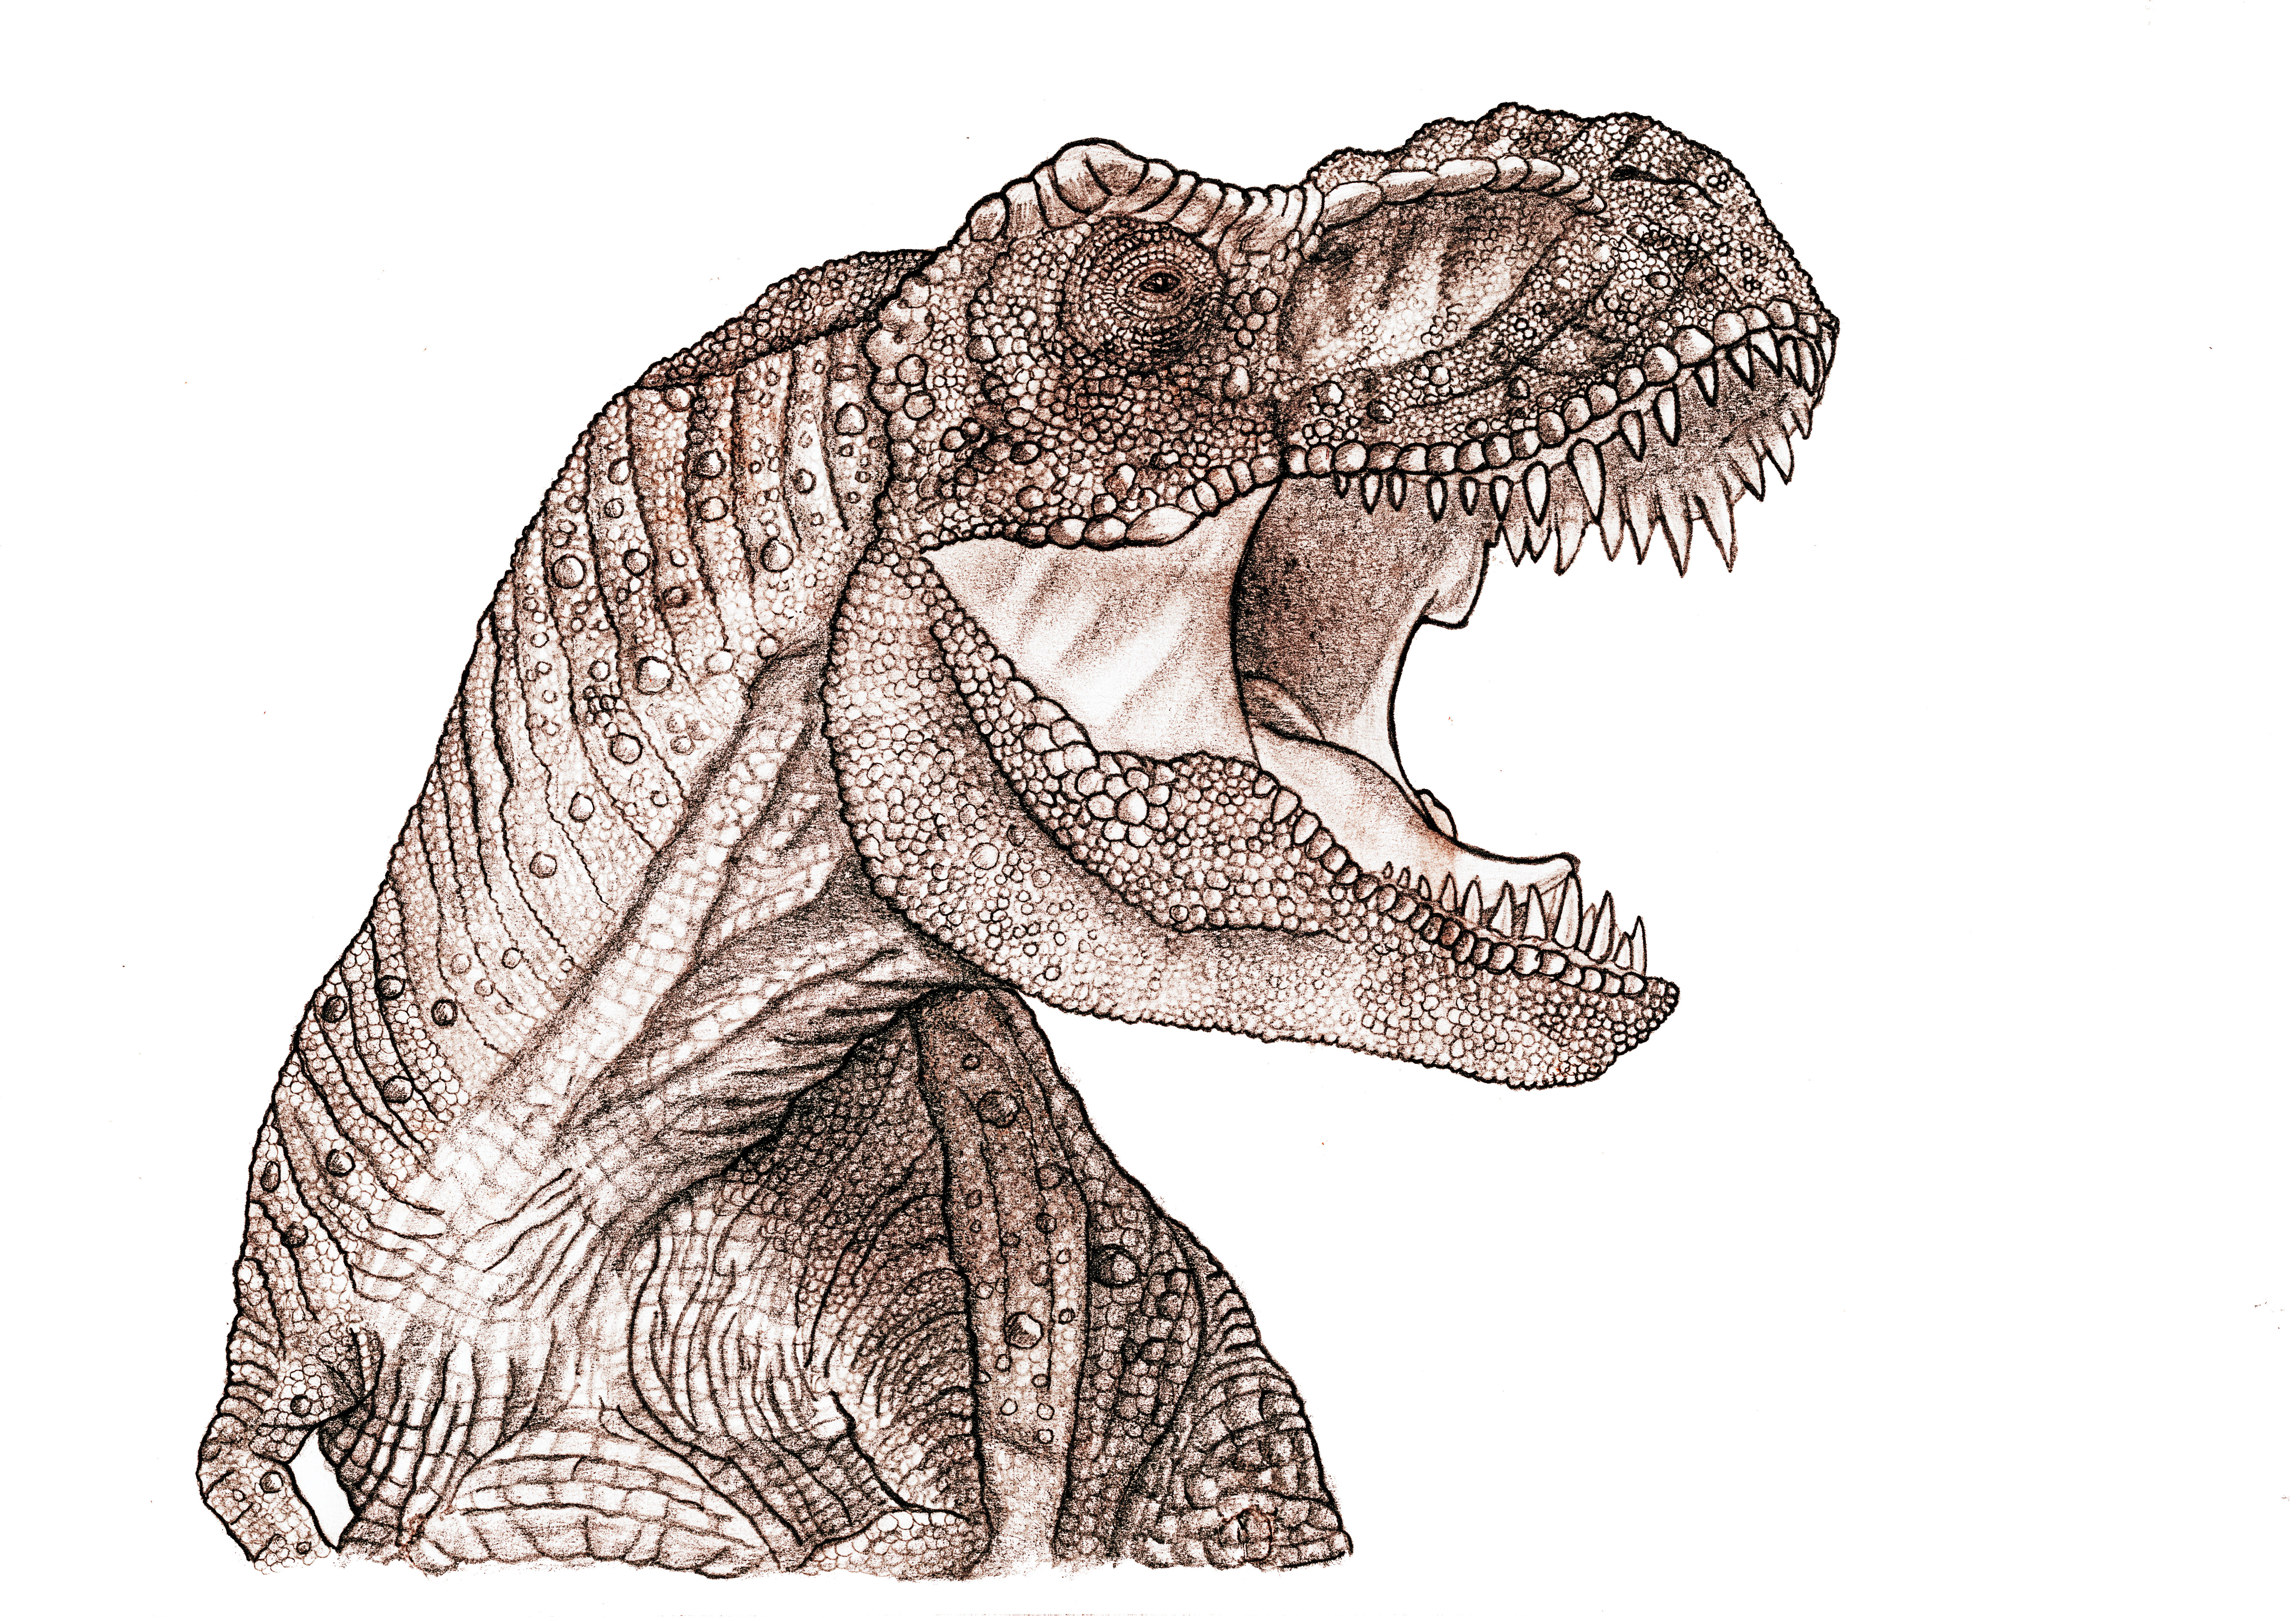 Jurassic Park Tyrannosaurus Roar by yankeetrex